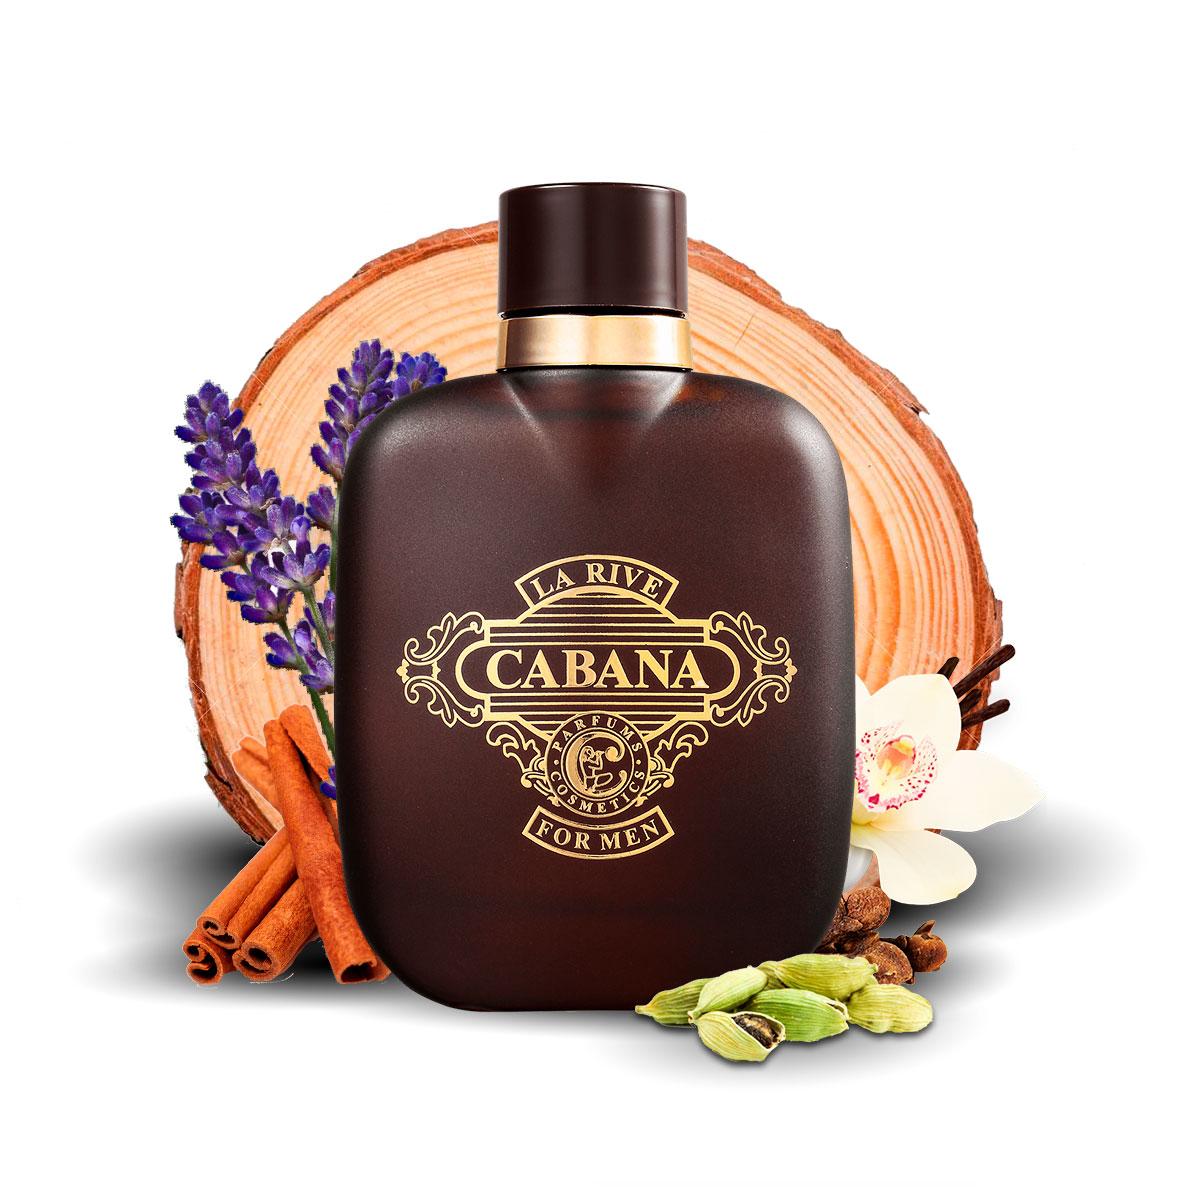 Kit 2 Perfumes Importados Cabana e Ironstone La Rive